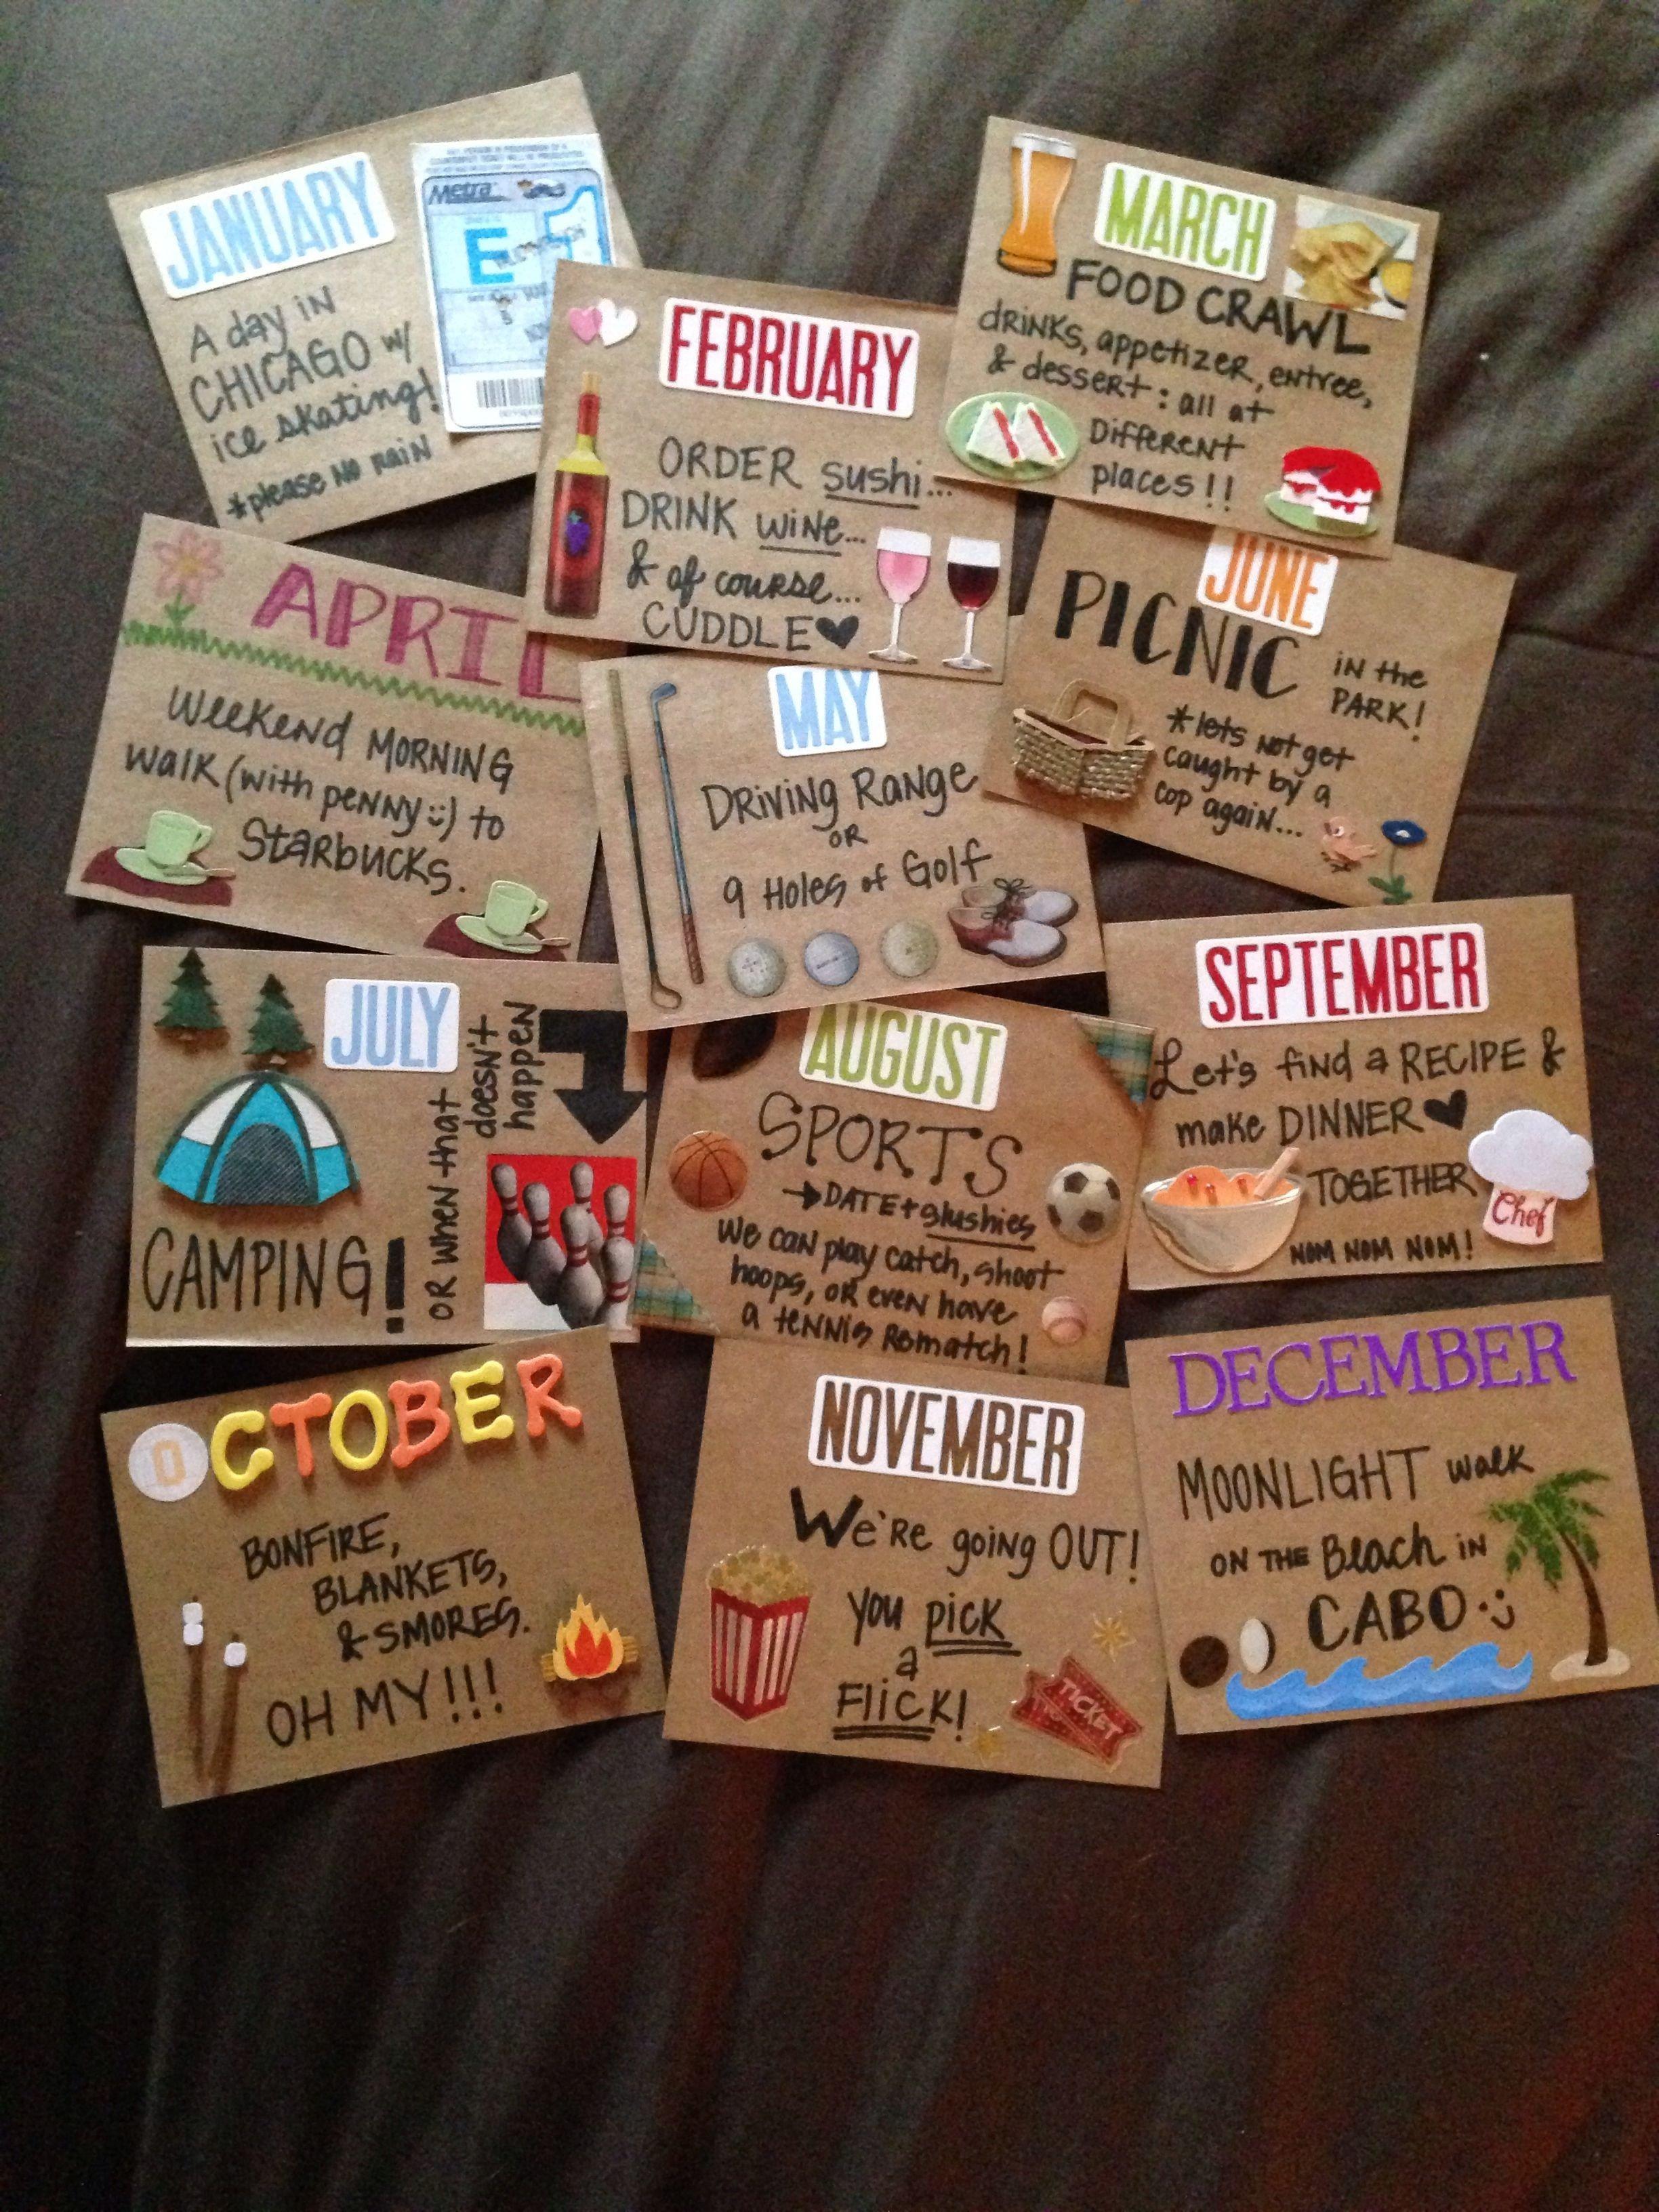 10 Gorgeous Couple Gift Ideas For Christmas